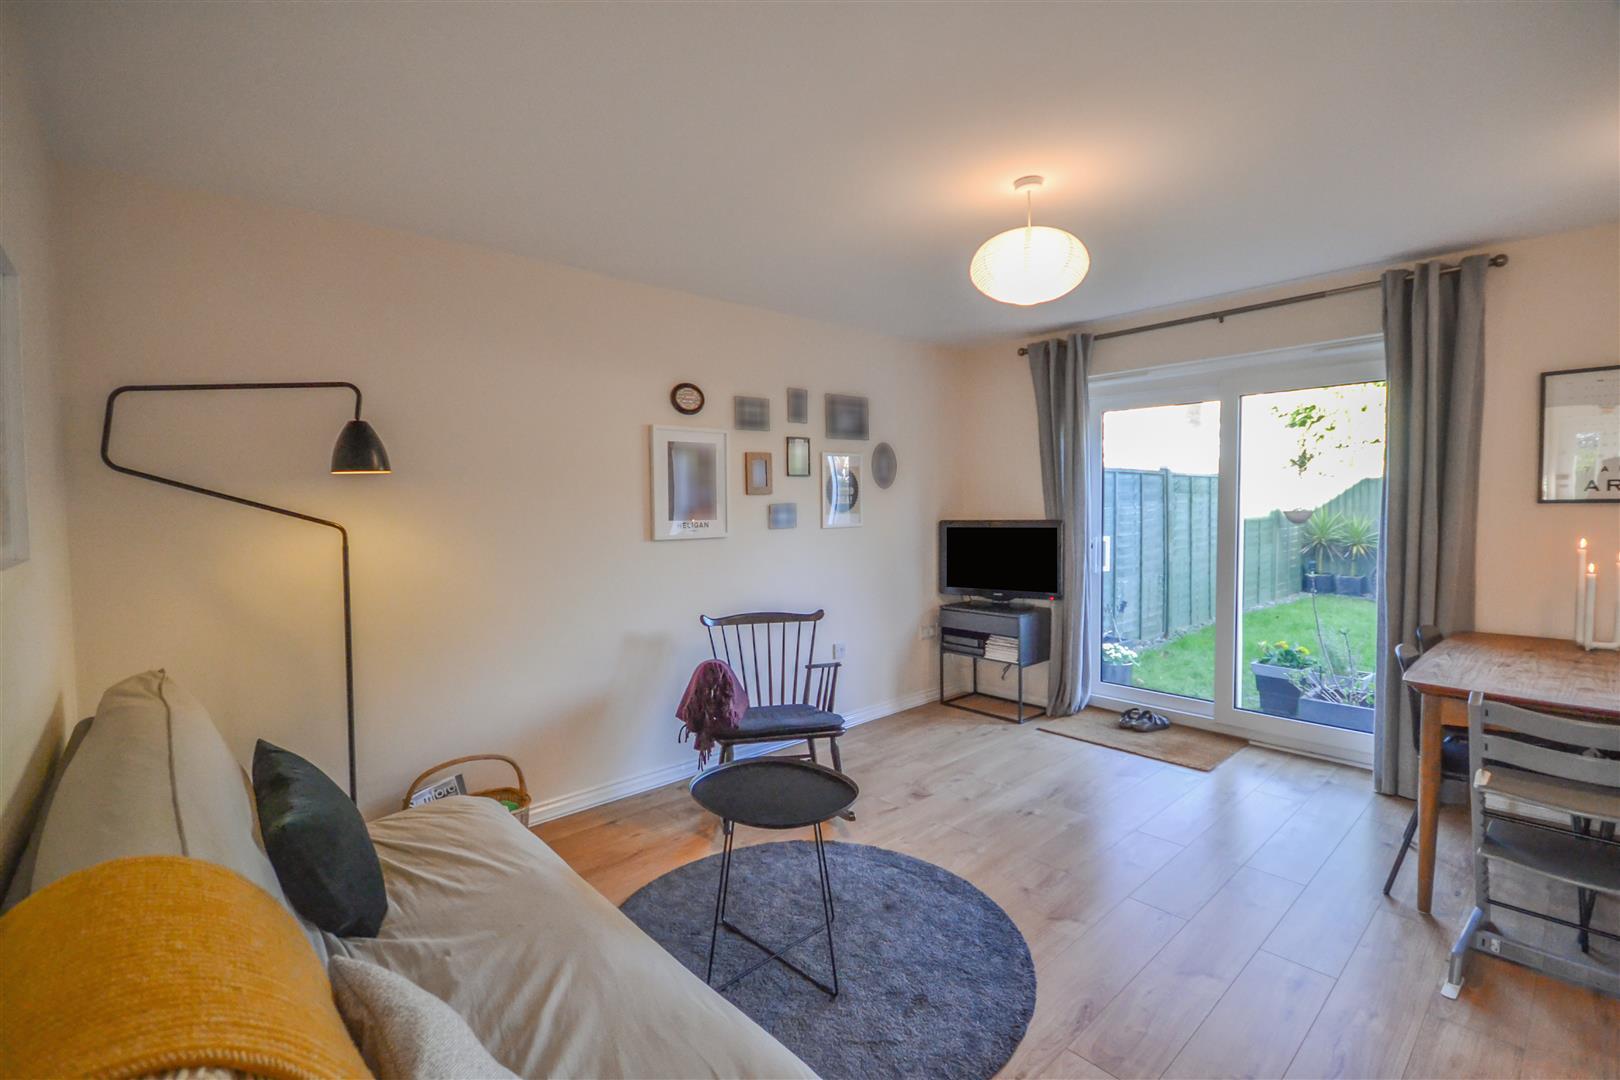 3 Bedroom House -